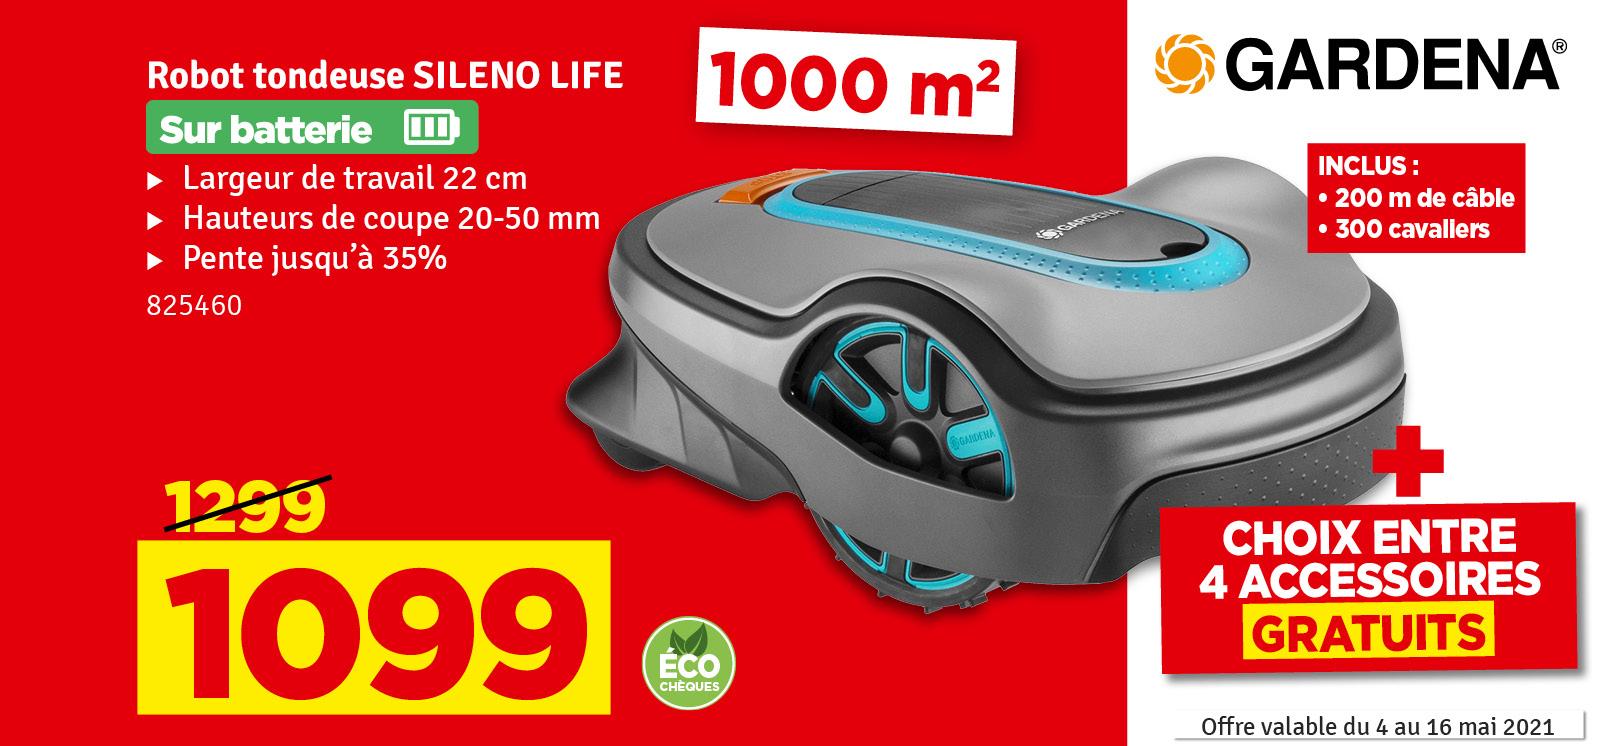 Promo - Tondeuse robot Sileno Life 1000 GARDENA